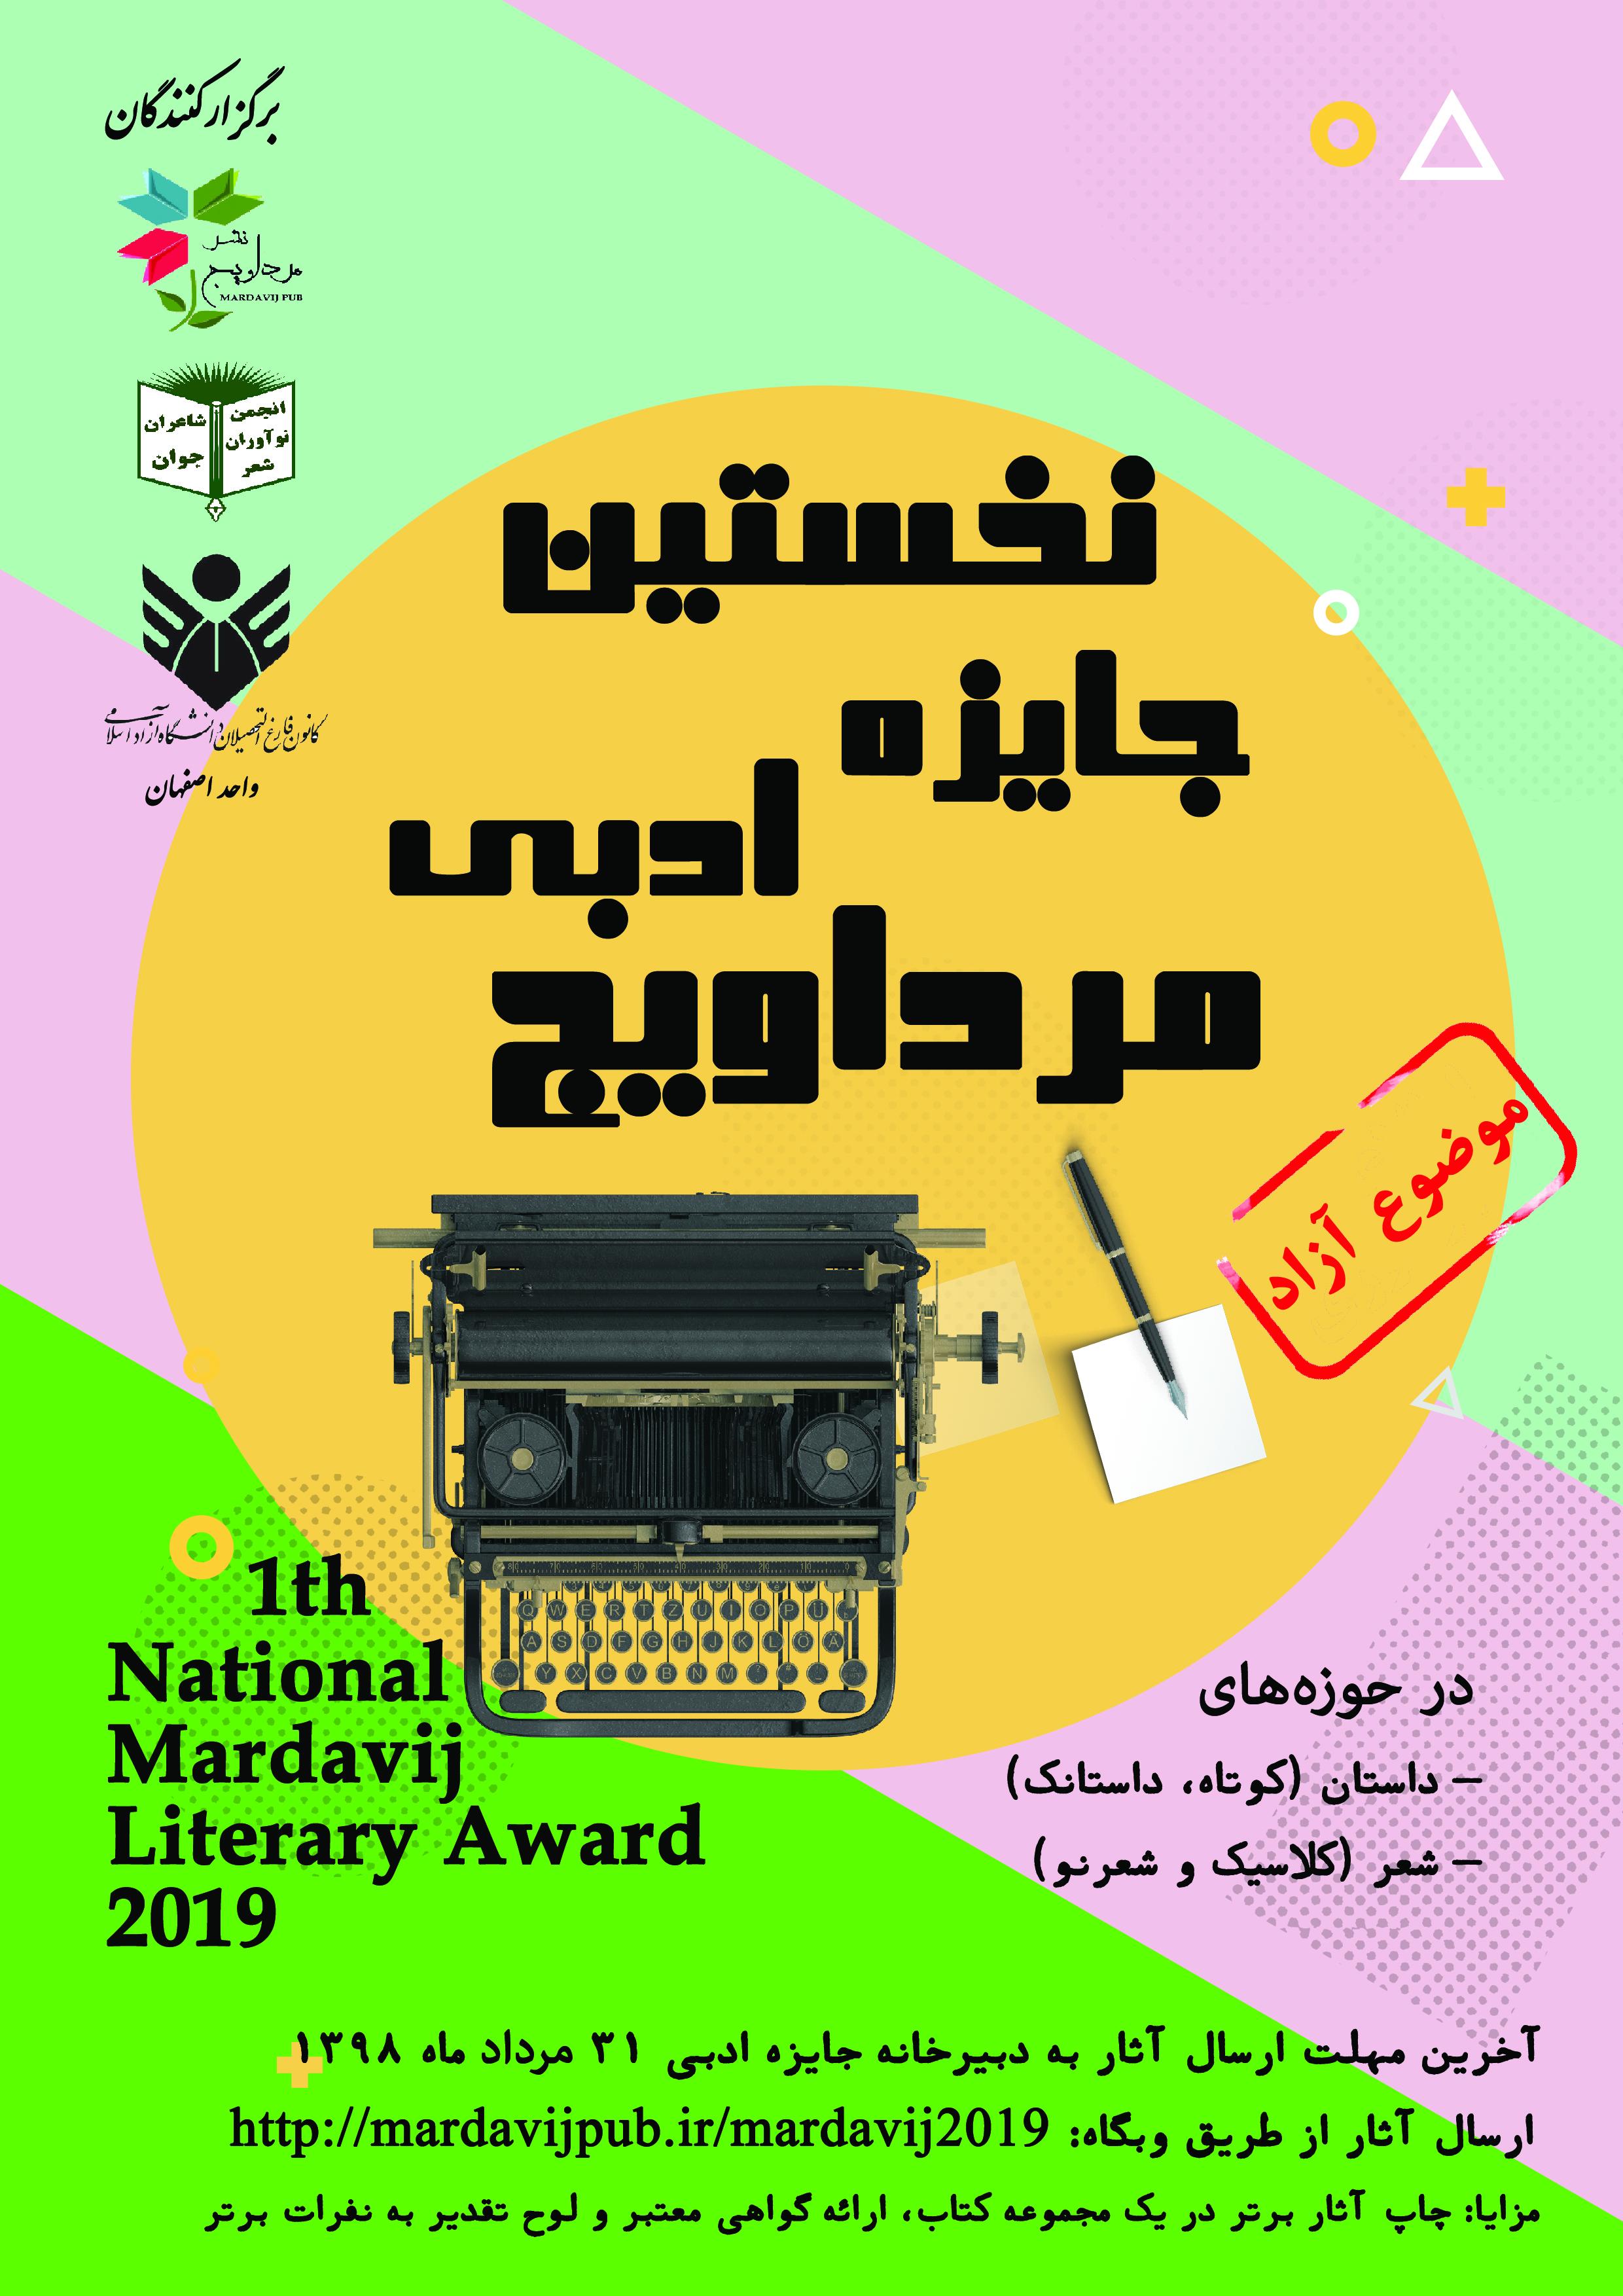 فراخوان اولین دوره جایزه ادبی مرداویج